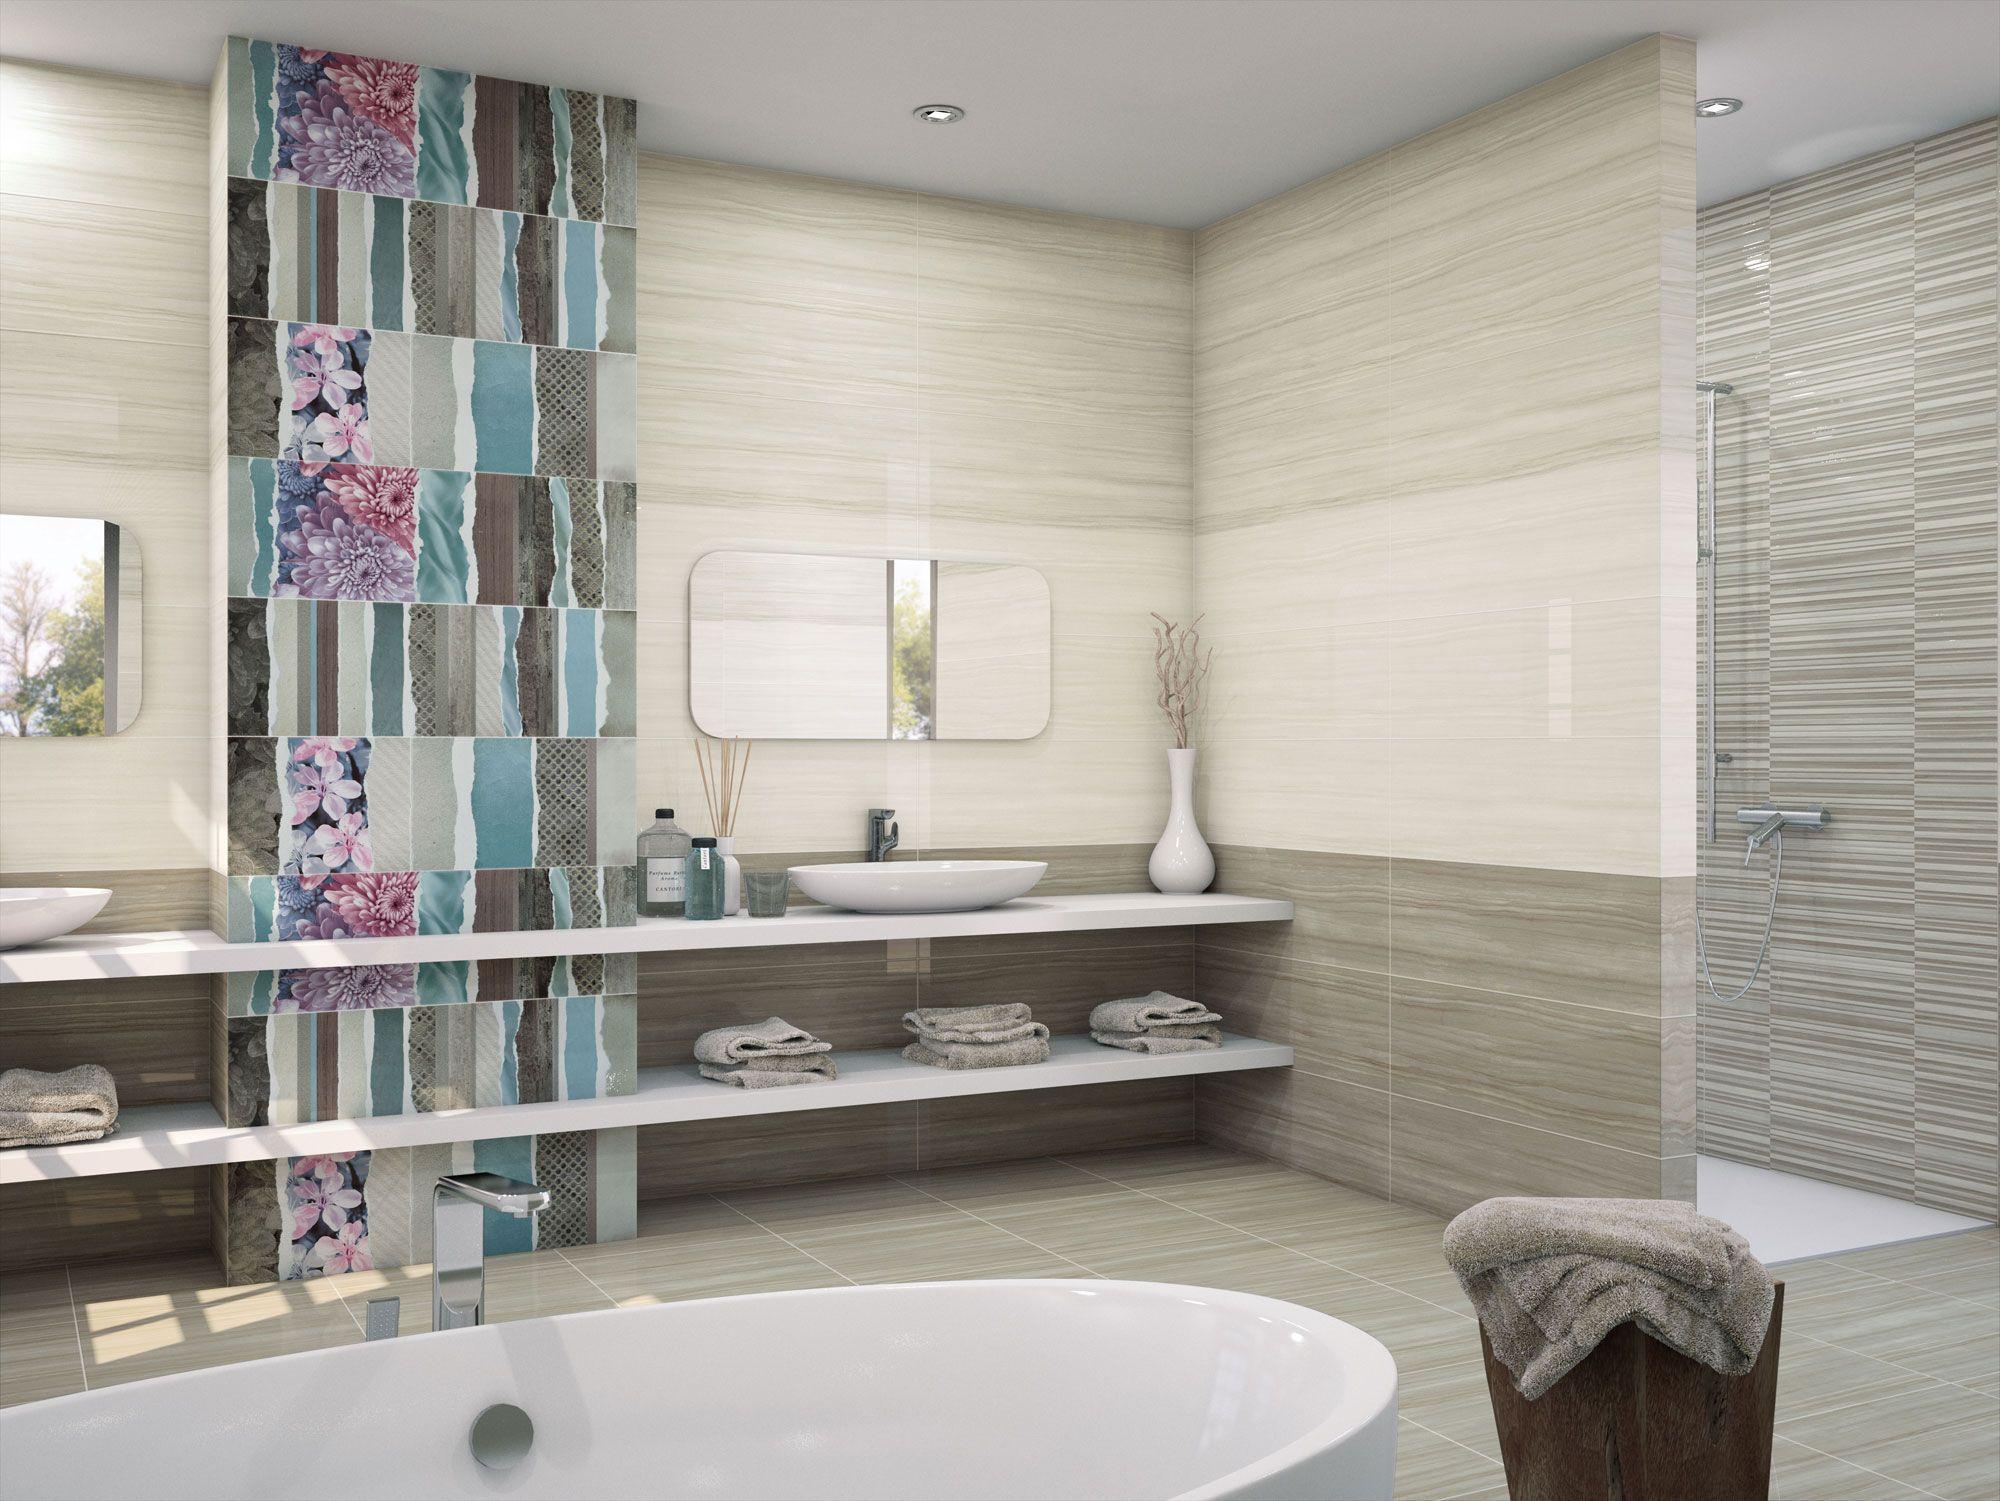 Neutral tones #bathroom with original and decorative wall ...